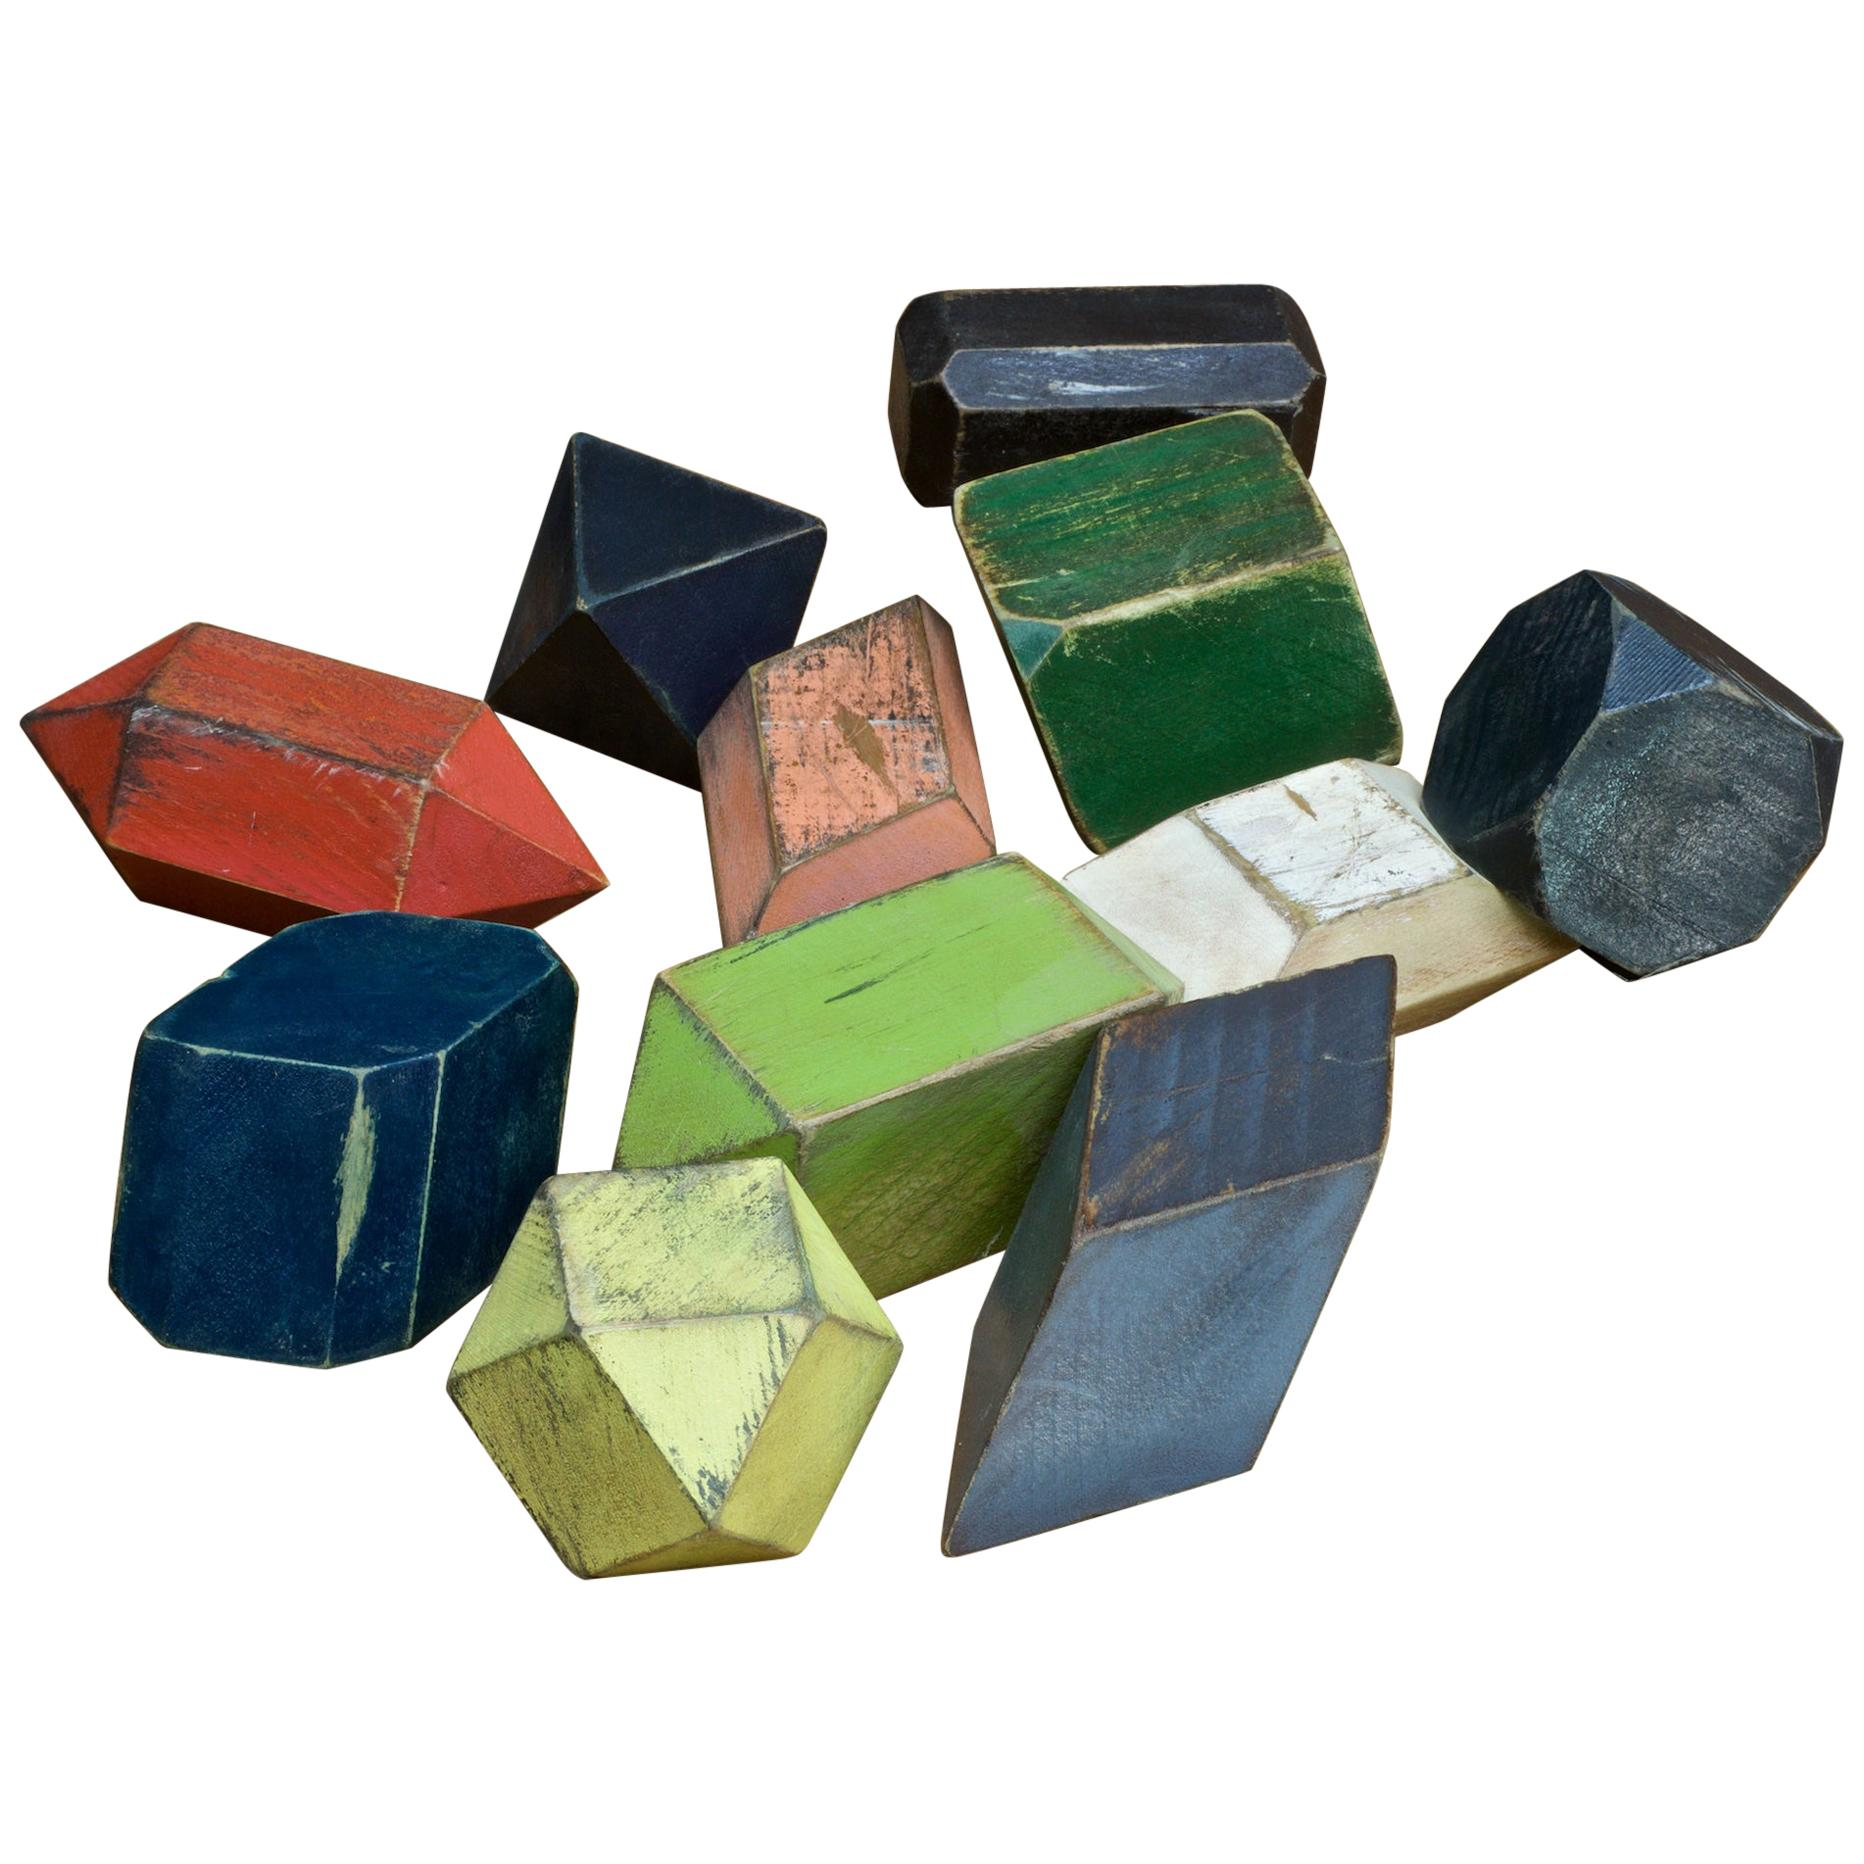 Geometric Geology Gemstone Wooden Crystal Models Atomic Toy Building Blocks